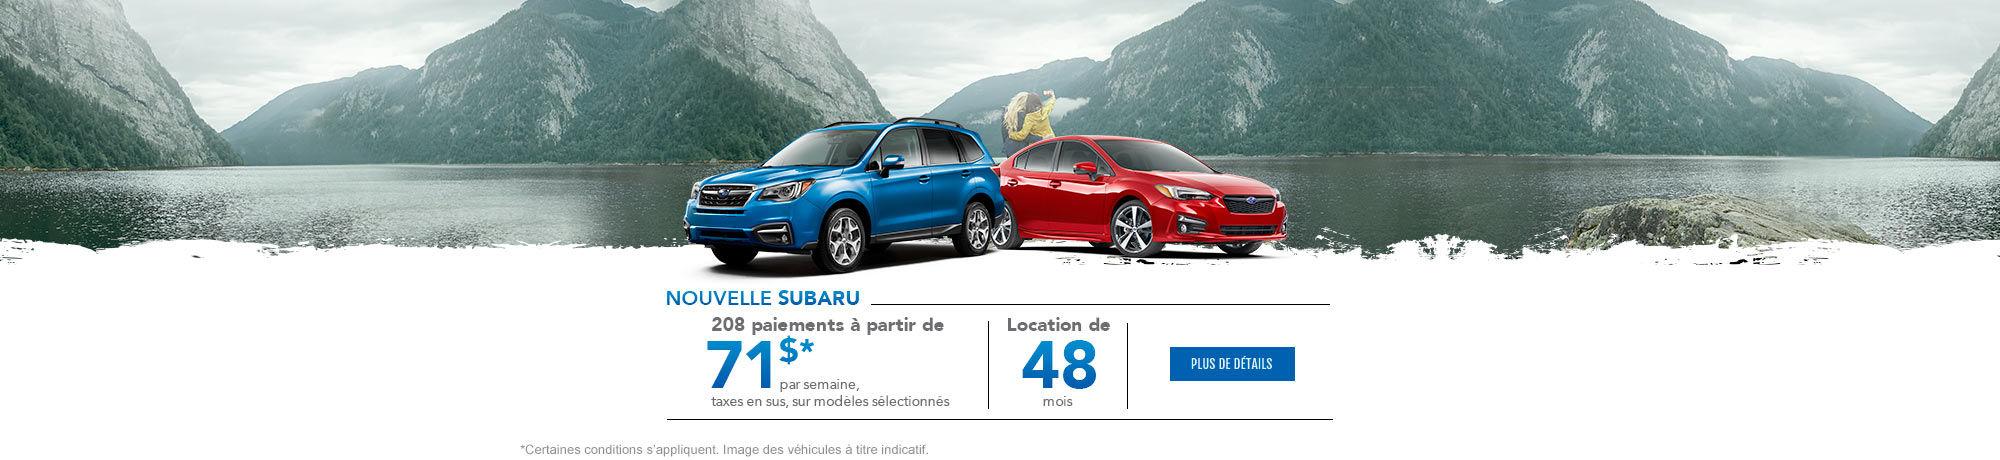 Nouvelle Subaru - Novembre